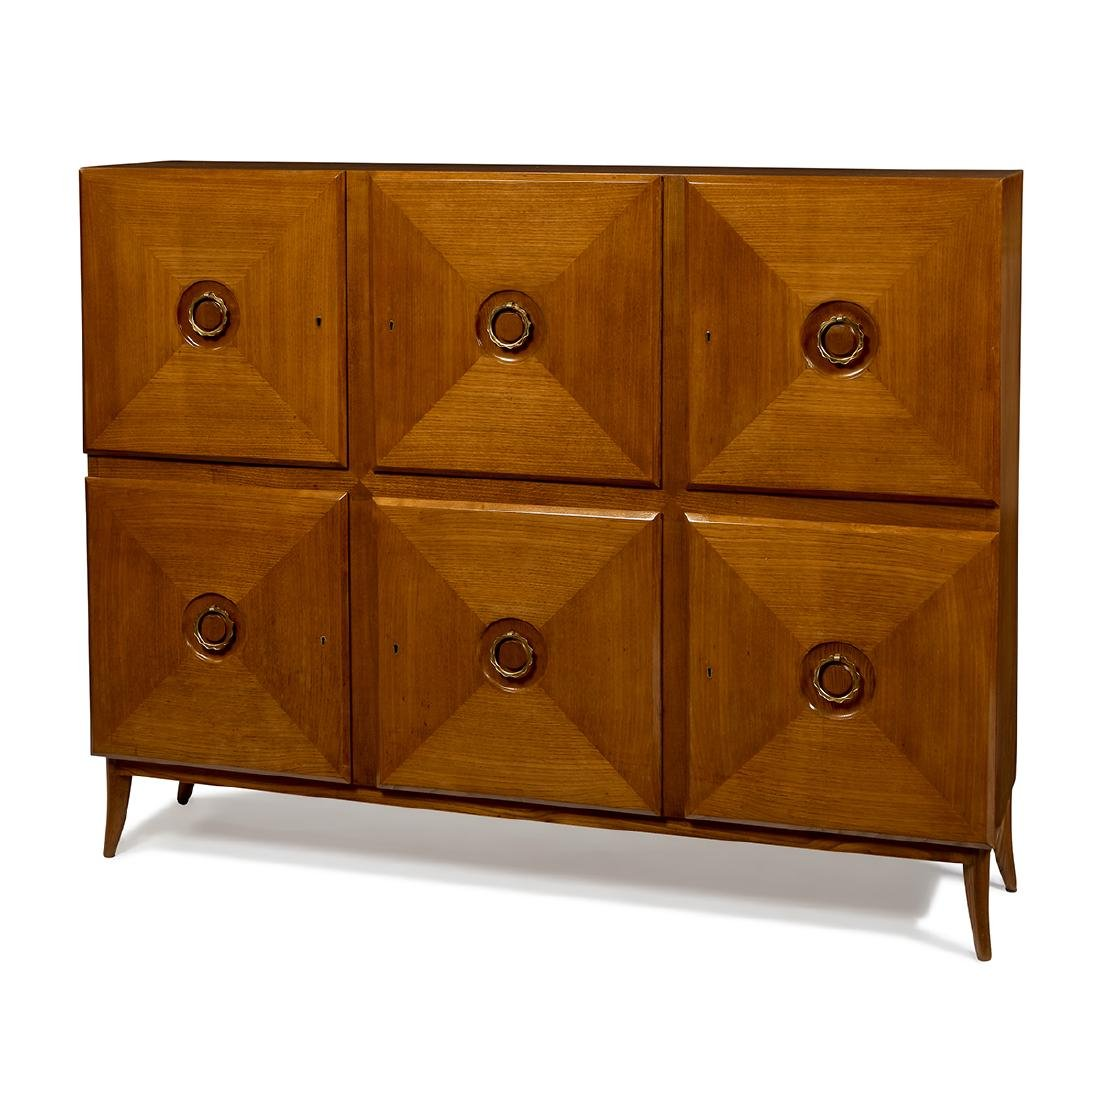 Paolo Buffa cabinet / sideboard - 2